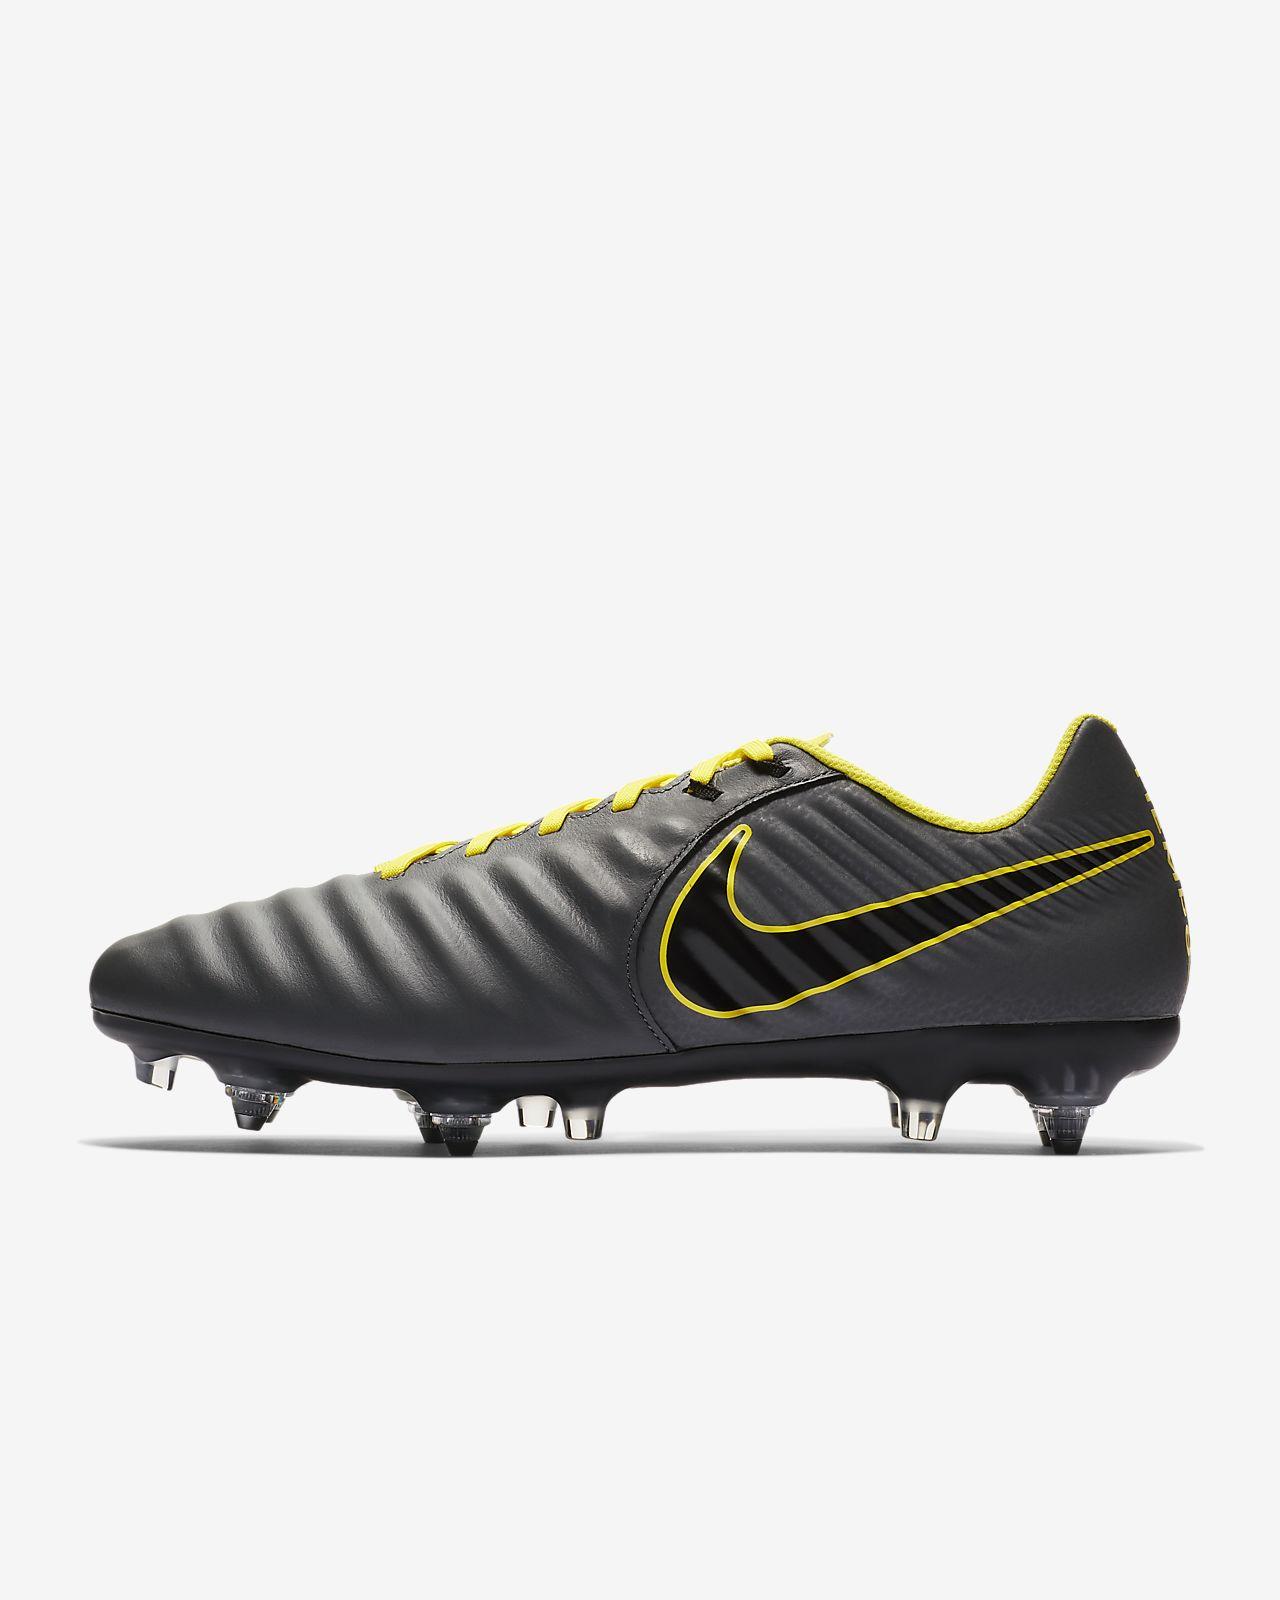 ffae9af70e2 ... Calzado de fútbol profesional para terreno blando Nike Legend 7 Academy  SG-Pro Anti-